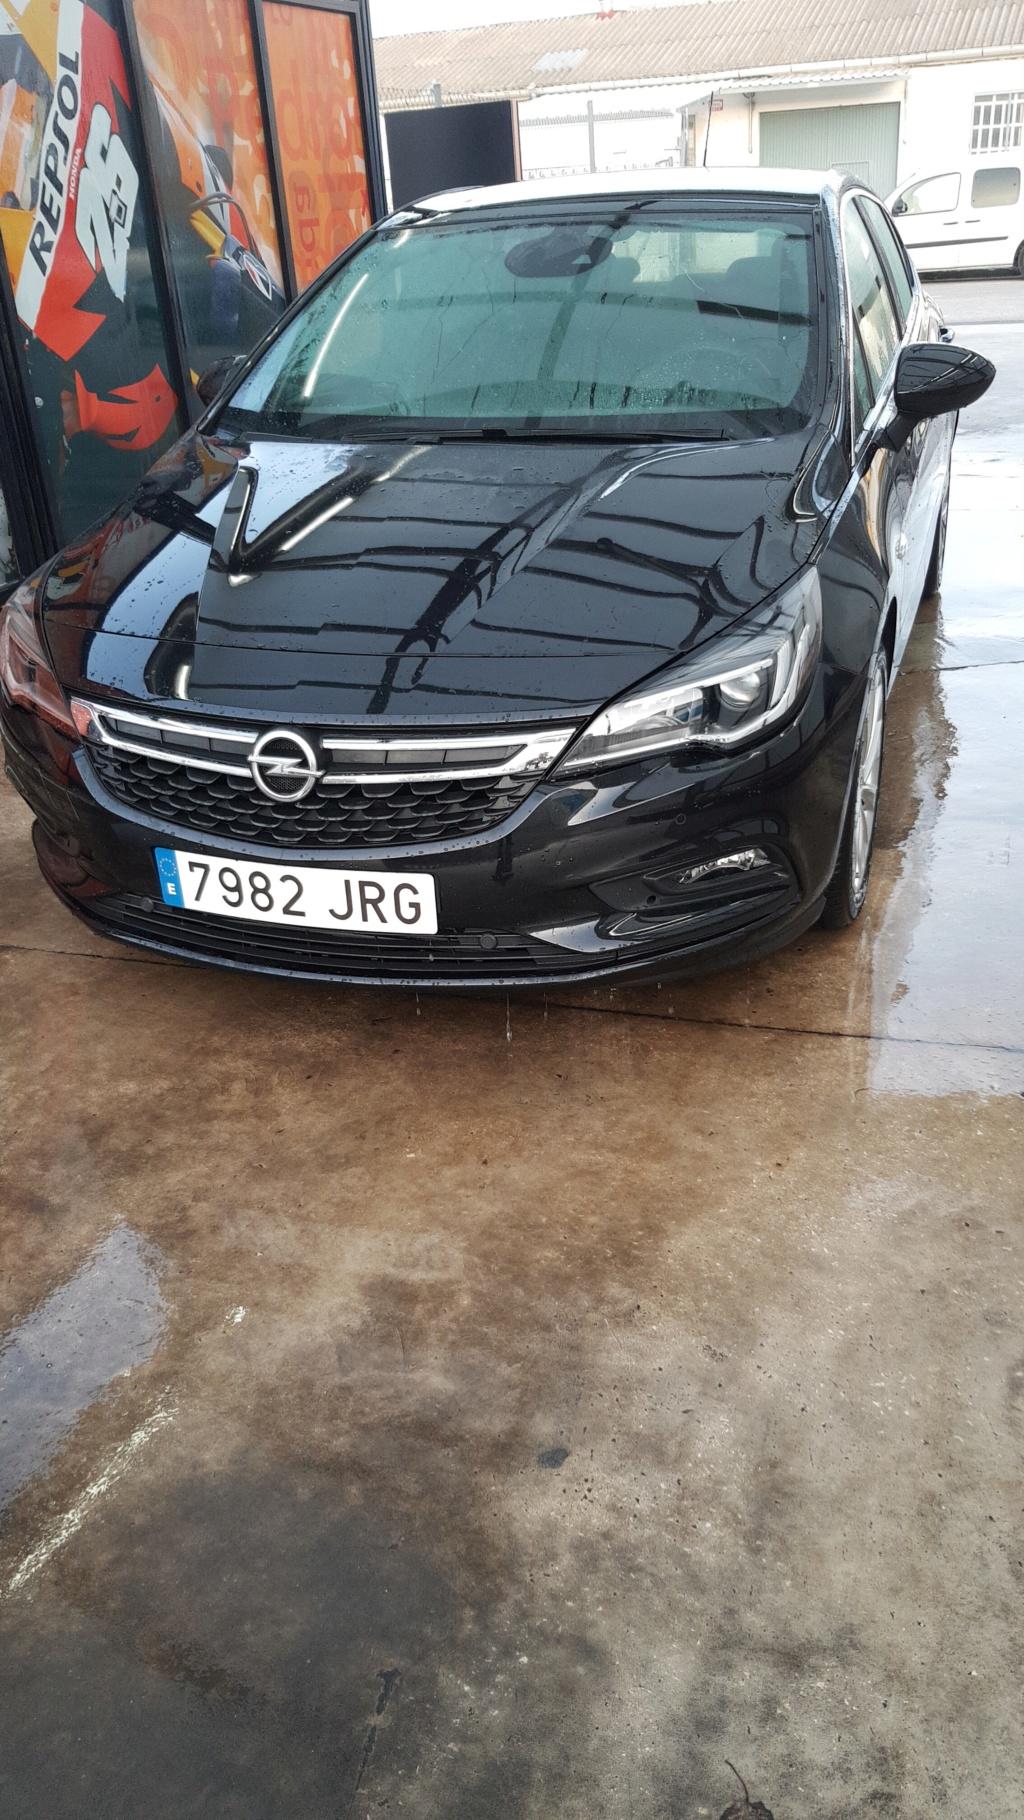 Presentacion Opel Astra K Img-2011